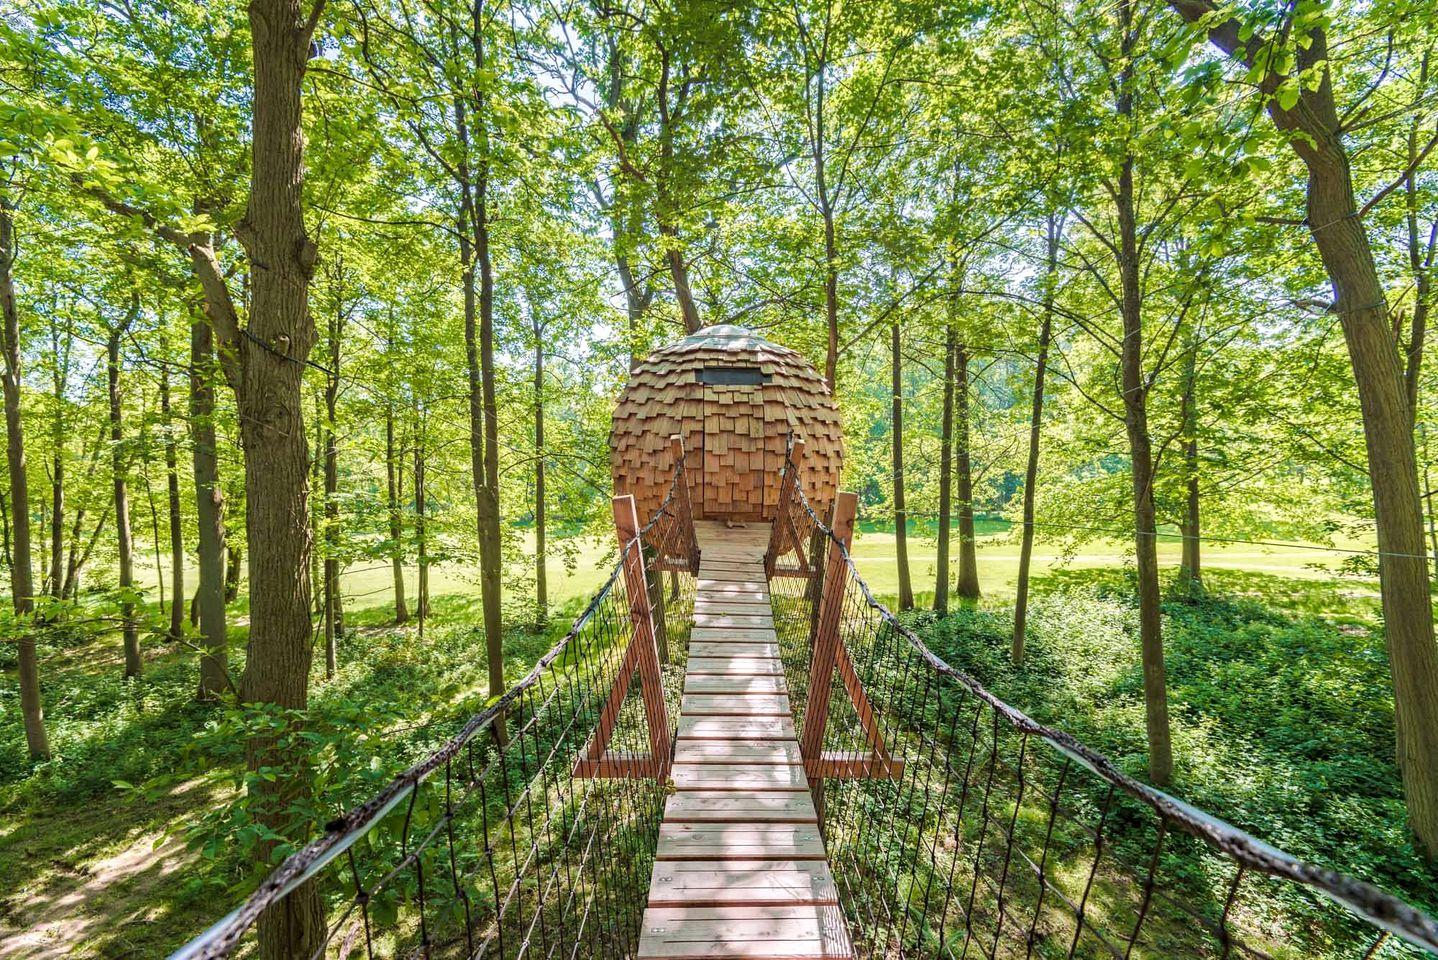 Tree Houses (Oise, Hauts-de-France, France)